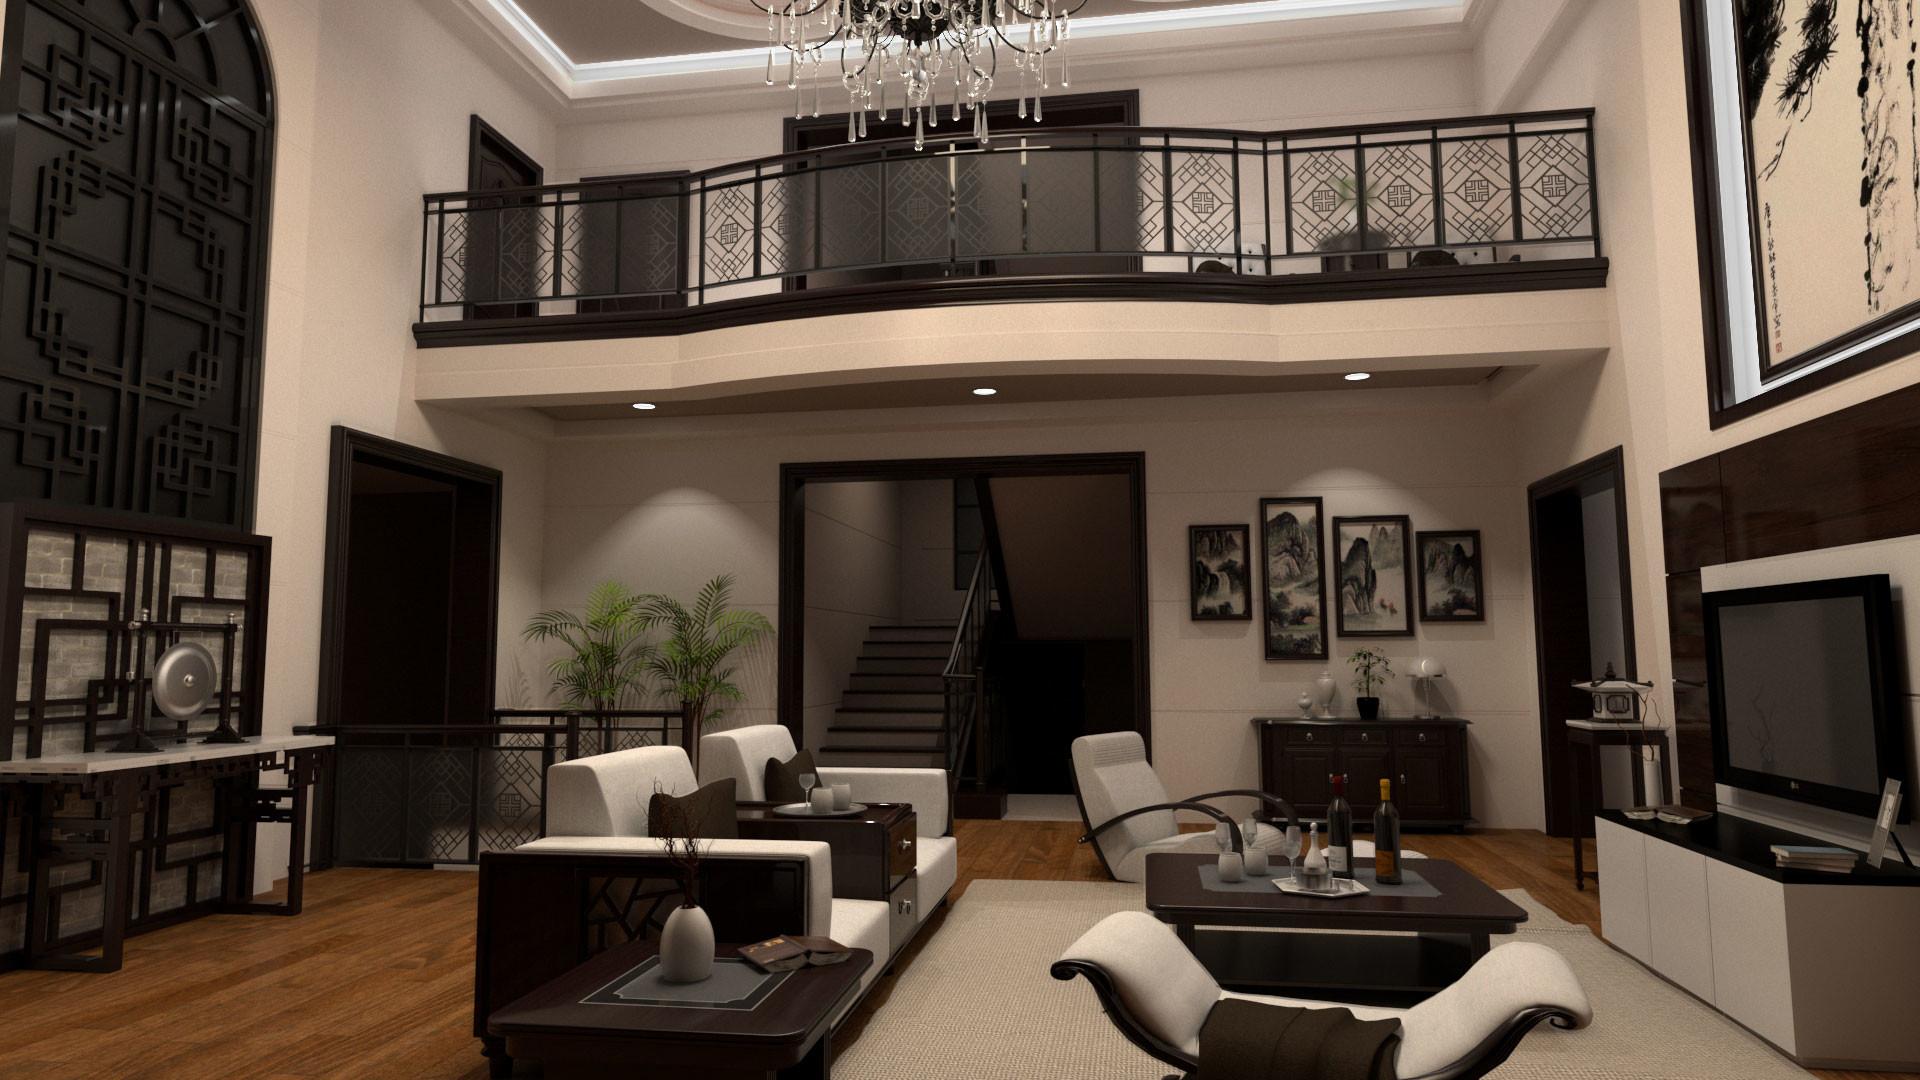 Modern Chinees Interieur : Artstation modern chinese interior design joey lee